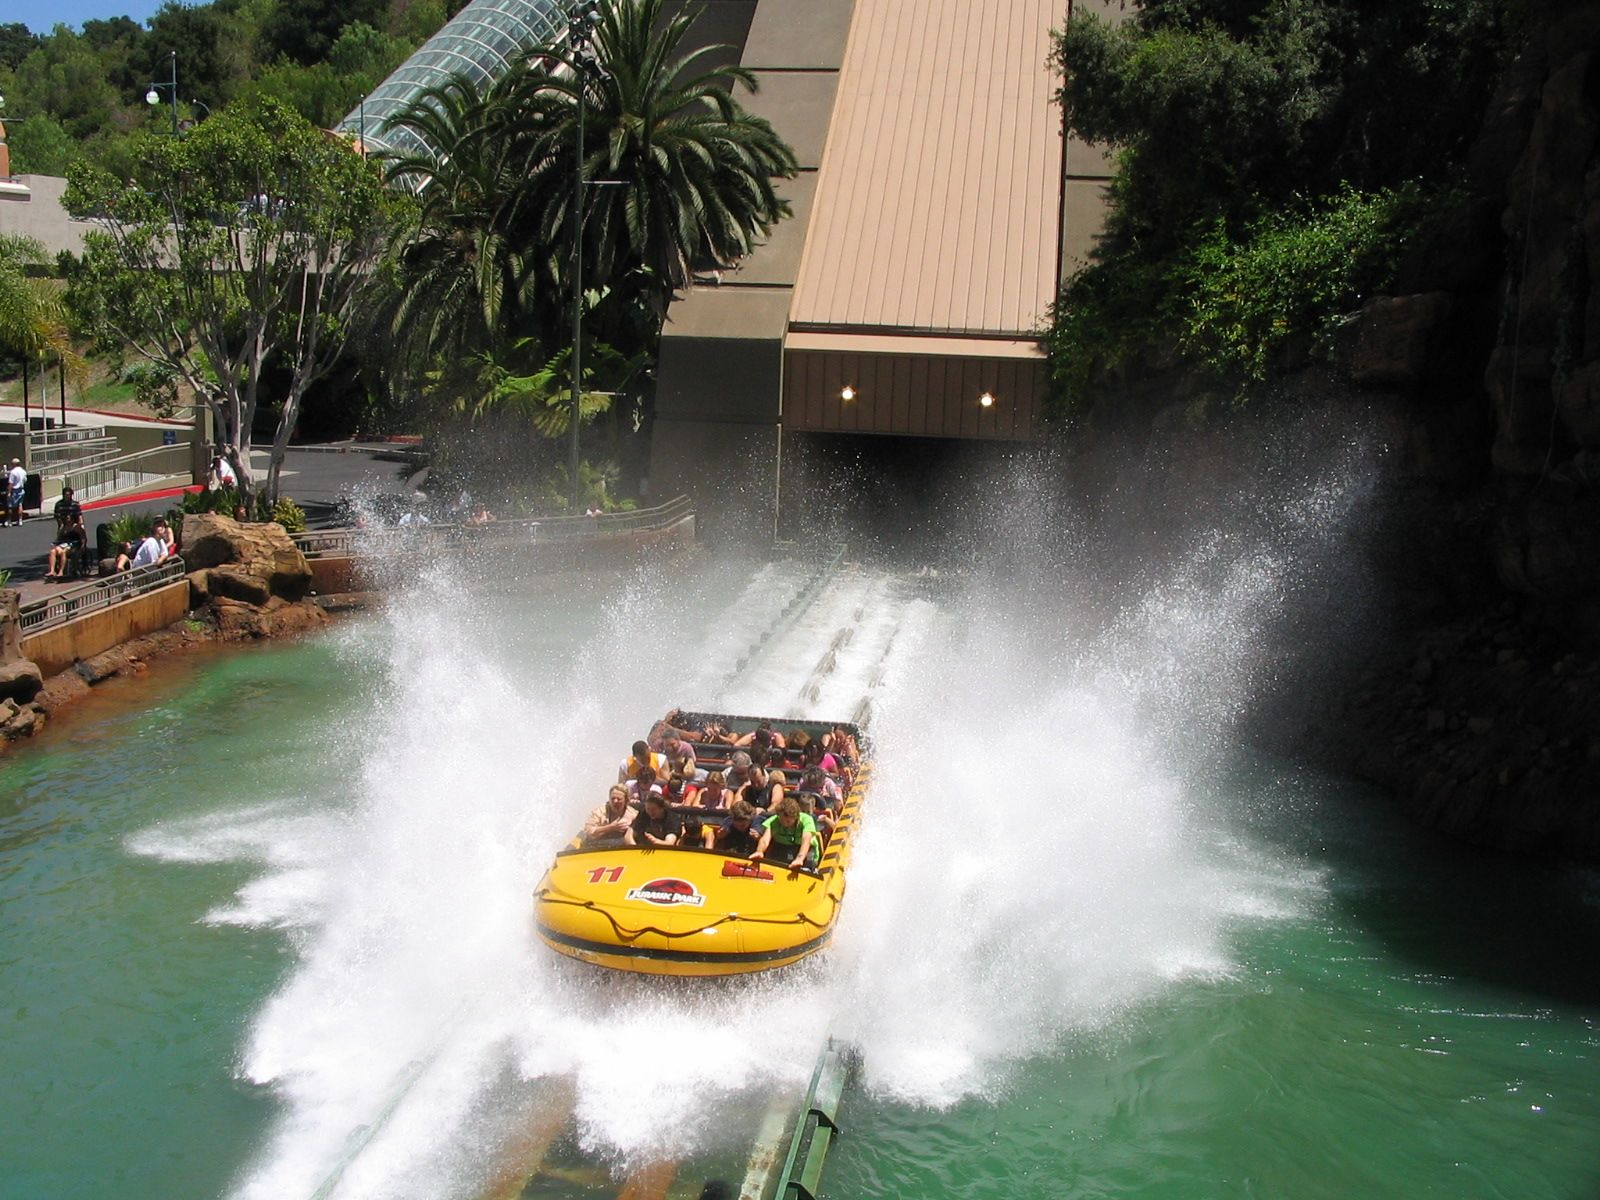 """Jurassic Park"" ride at Universal Studios, California | My ..."